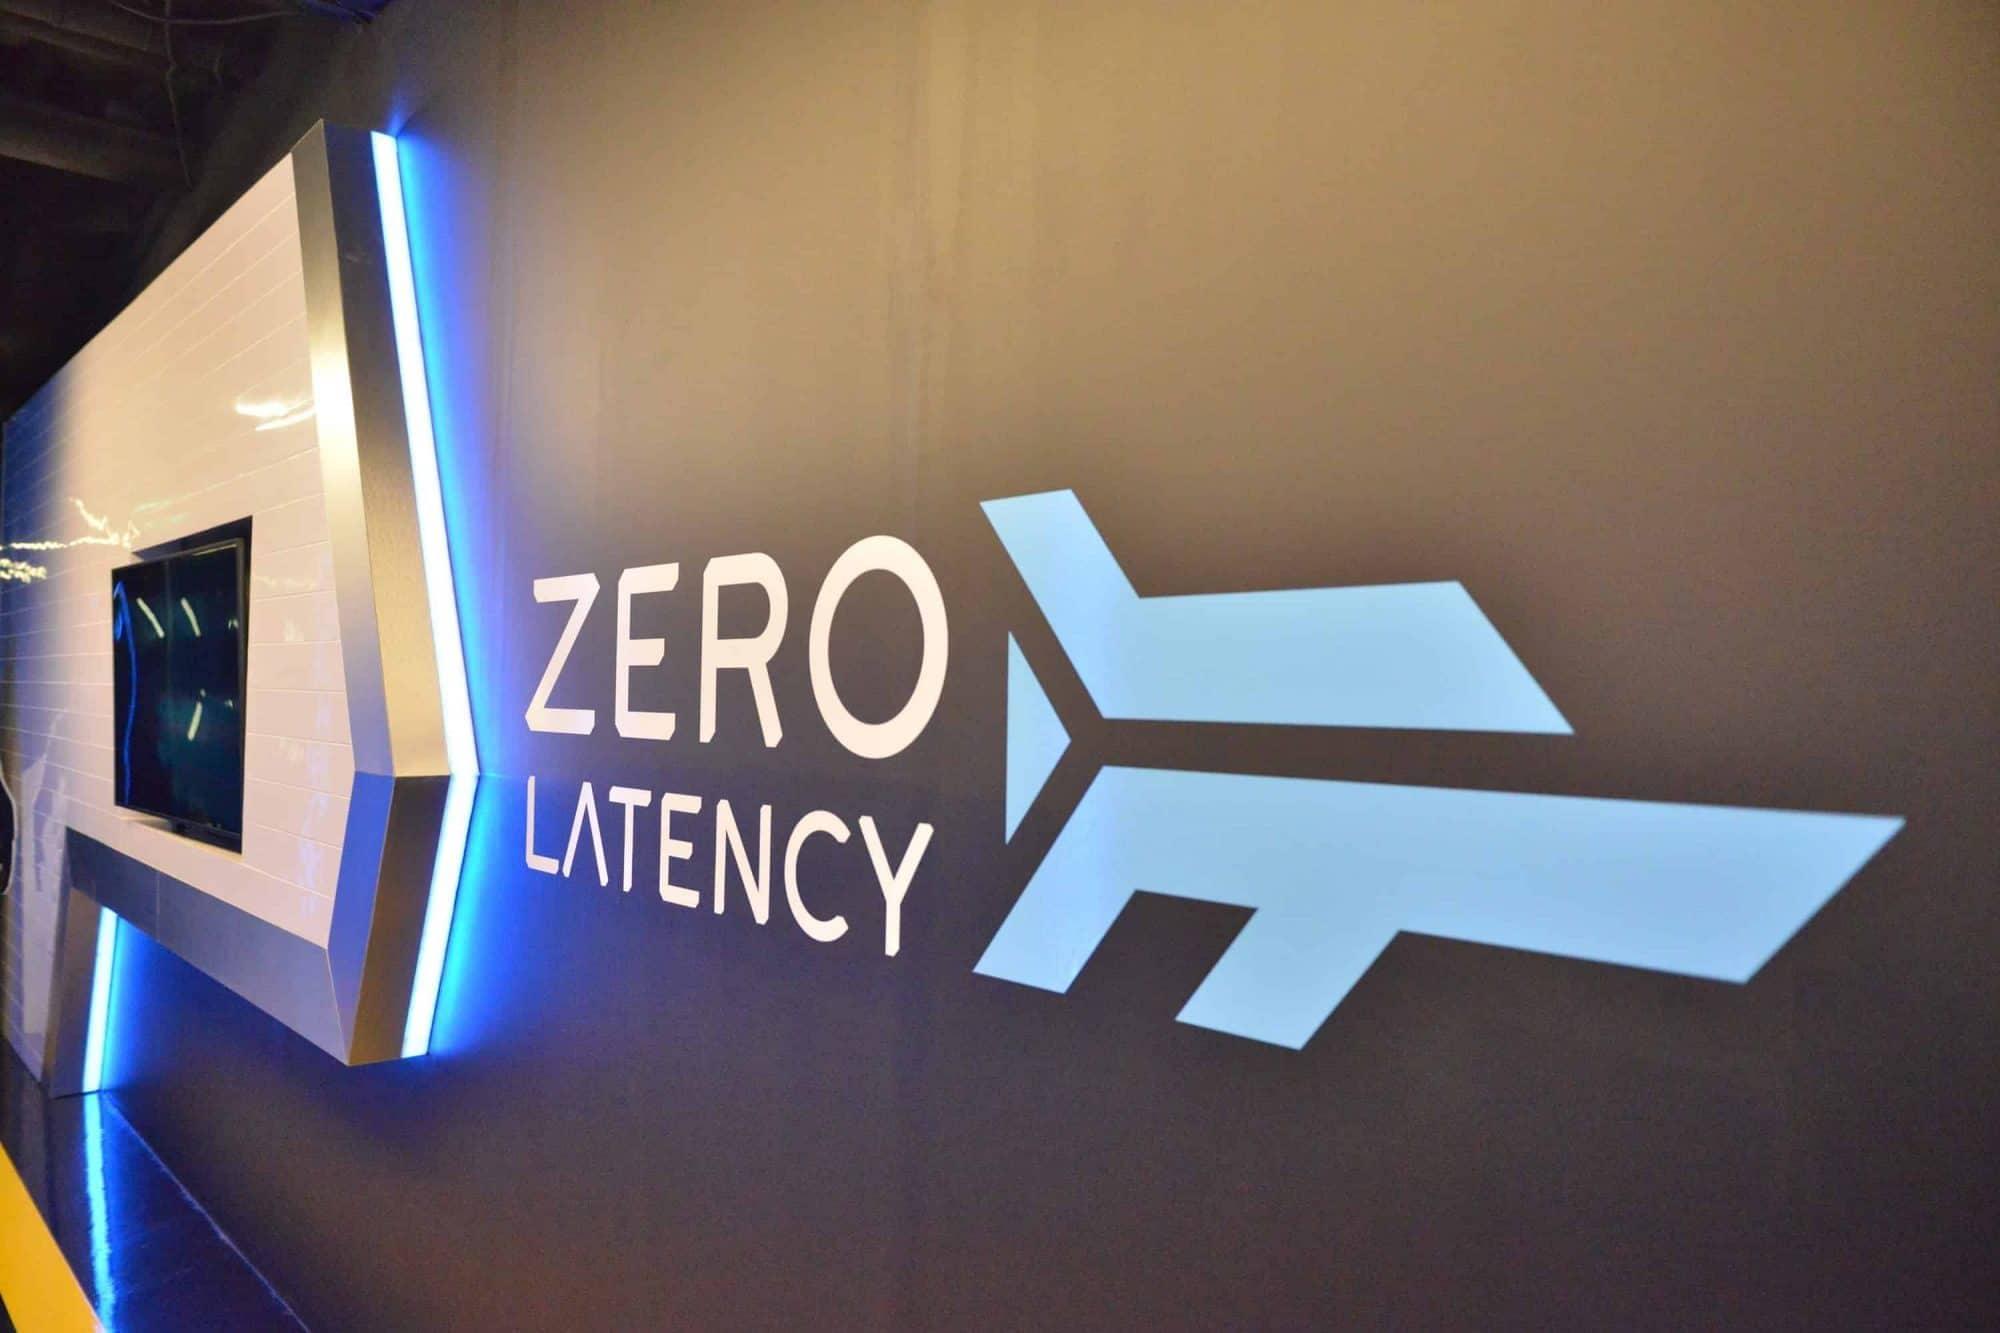 ZERO LATENCY สนามแข่งขันเกม VR ในระบบไร้สาย เปิดตัวในไทยแล้ว ณ โรงแรมโนโวเทล สยามสแควร์ 2